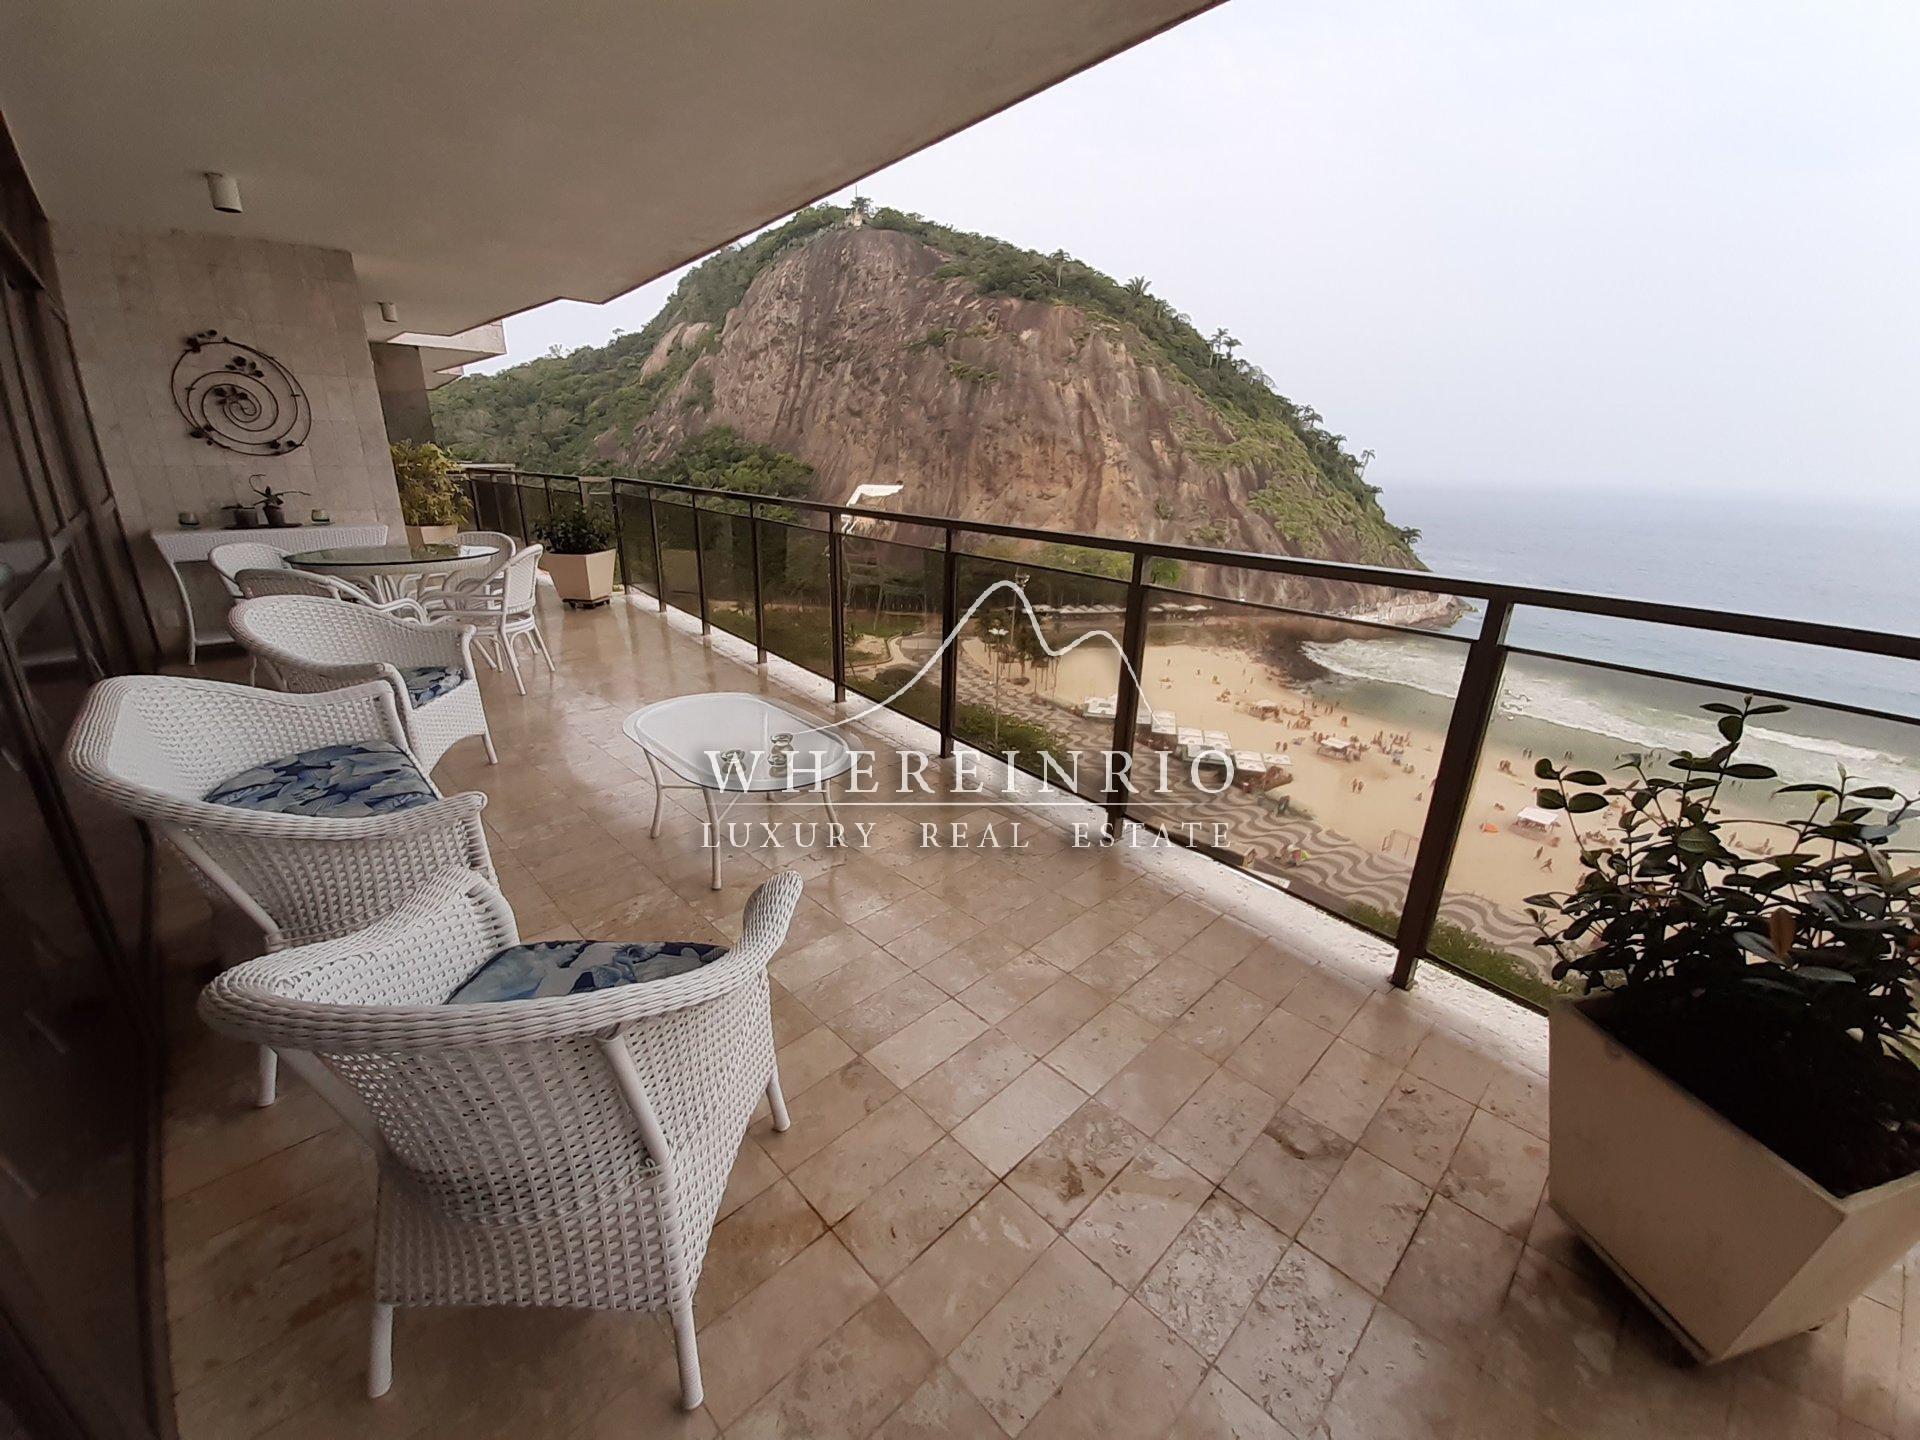 Apartment in Rio de Janeiro, State of Rio de Janeiro, Brazil 1 - 10665358